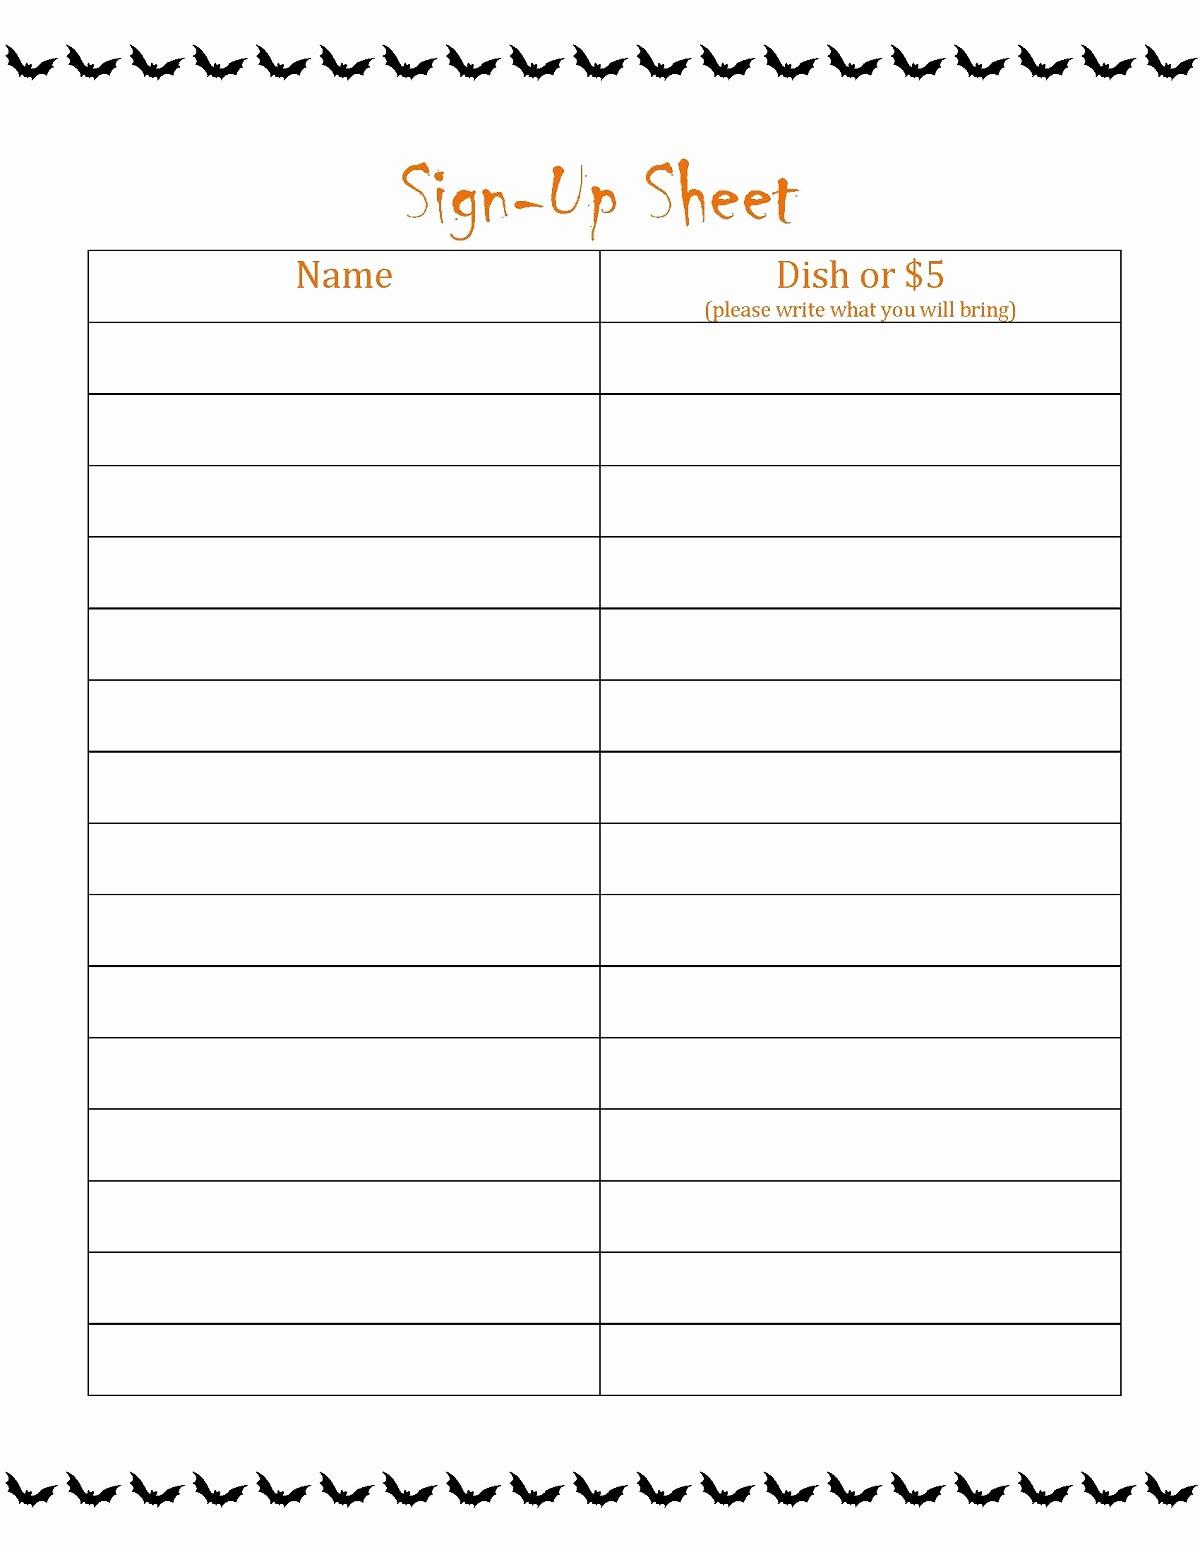 Thanksgiving Sign Up Sheet Printable Luxury Thanksgiving Potluck Sign Up Sheet Printable Awesome Free